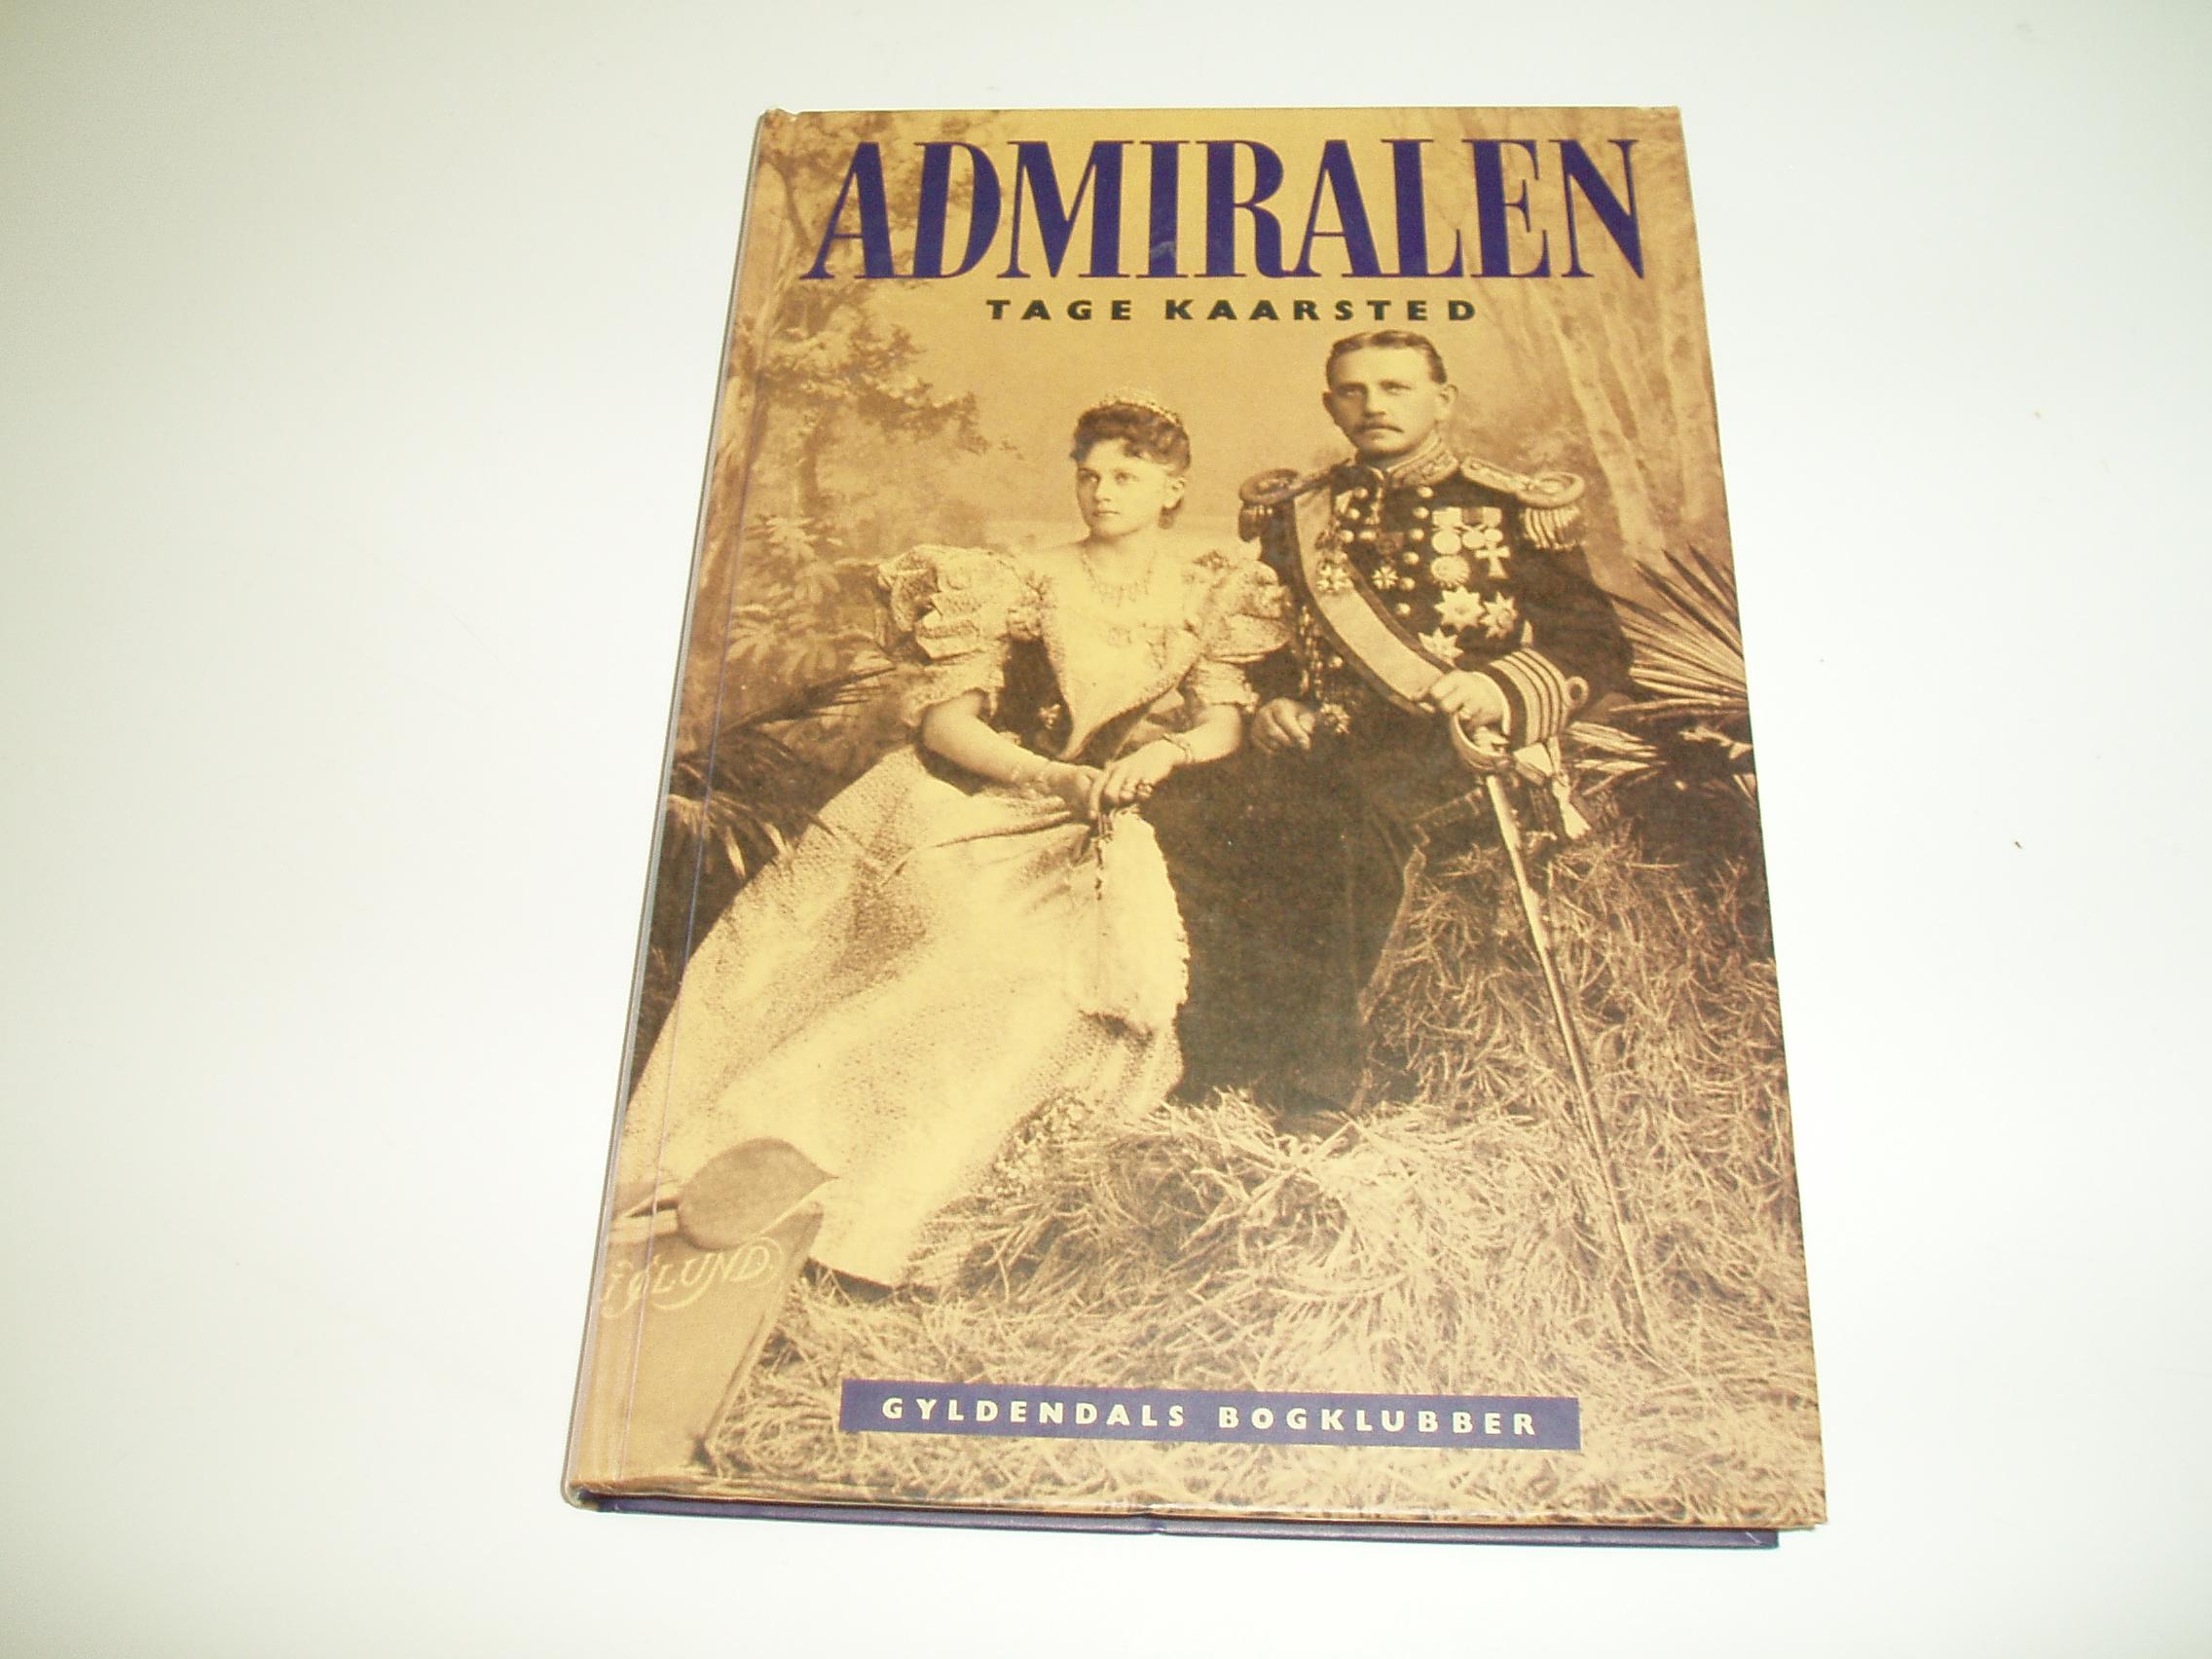 Admiralen. Andreas de Richelieu. Forretningsmand og politiker i